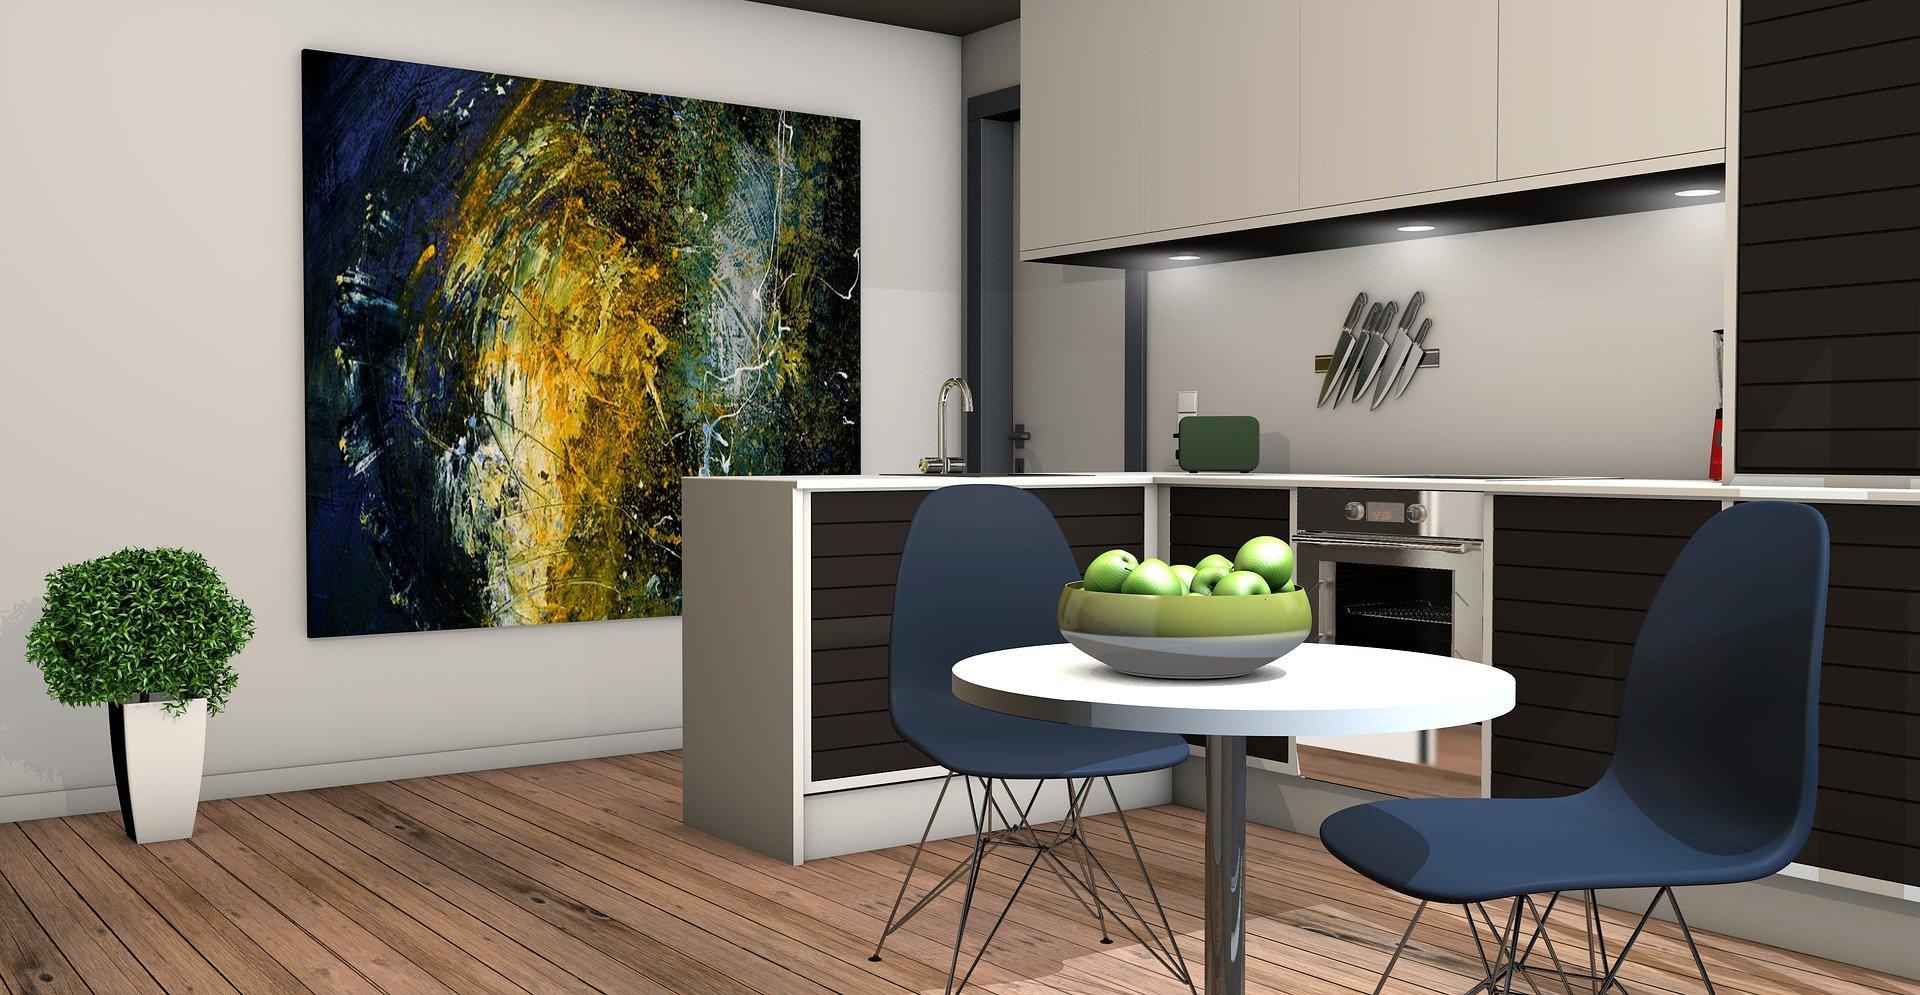 montreal housing market